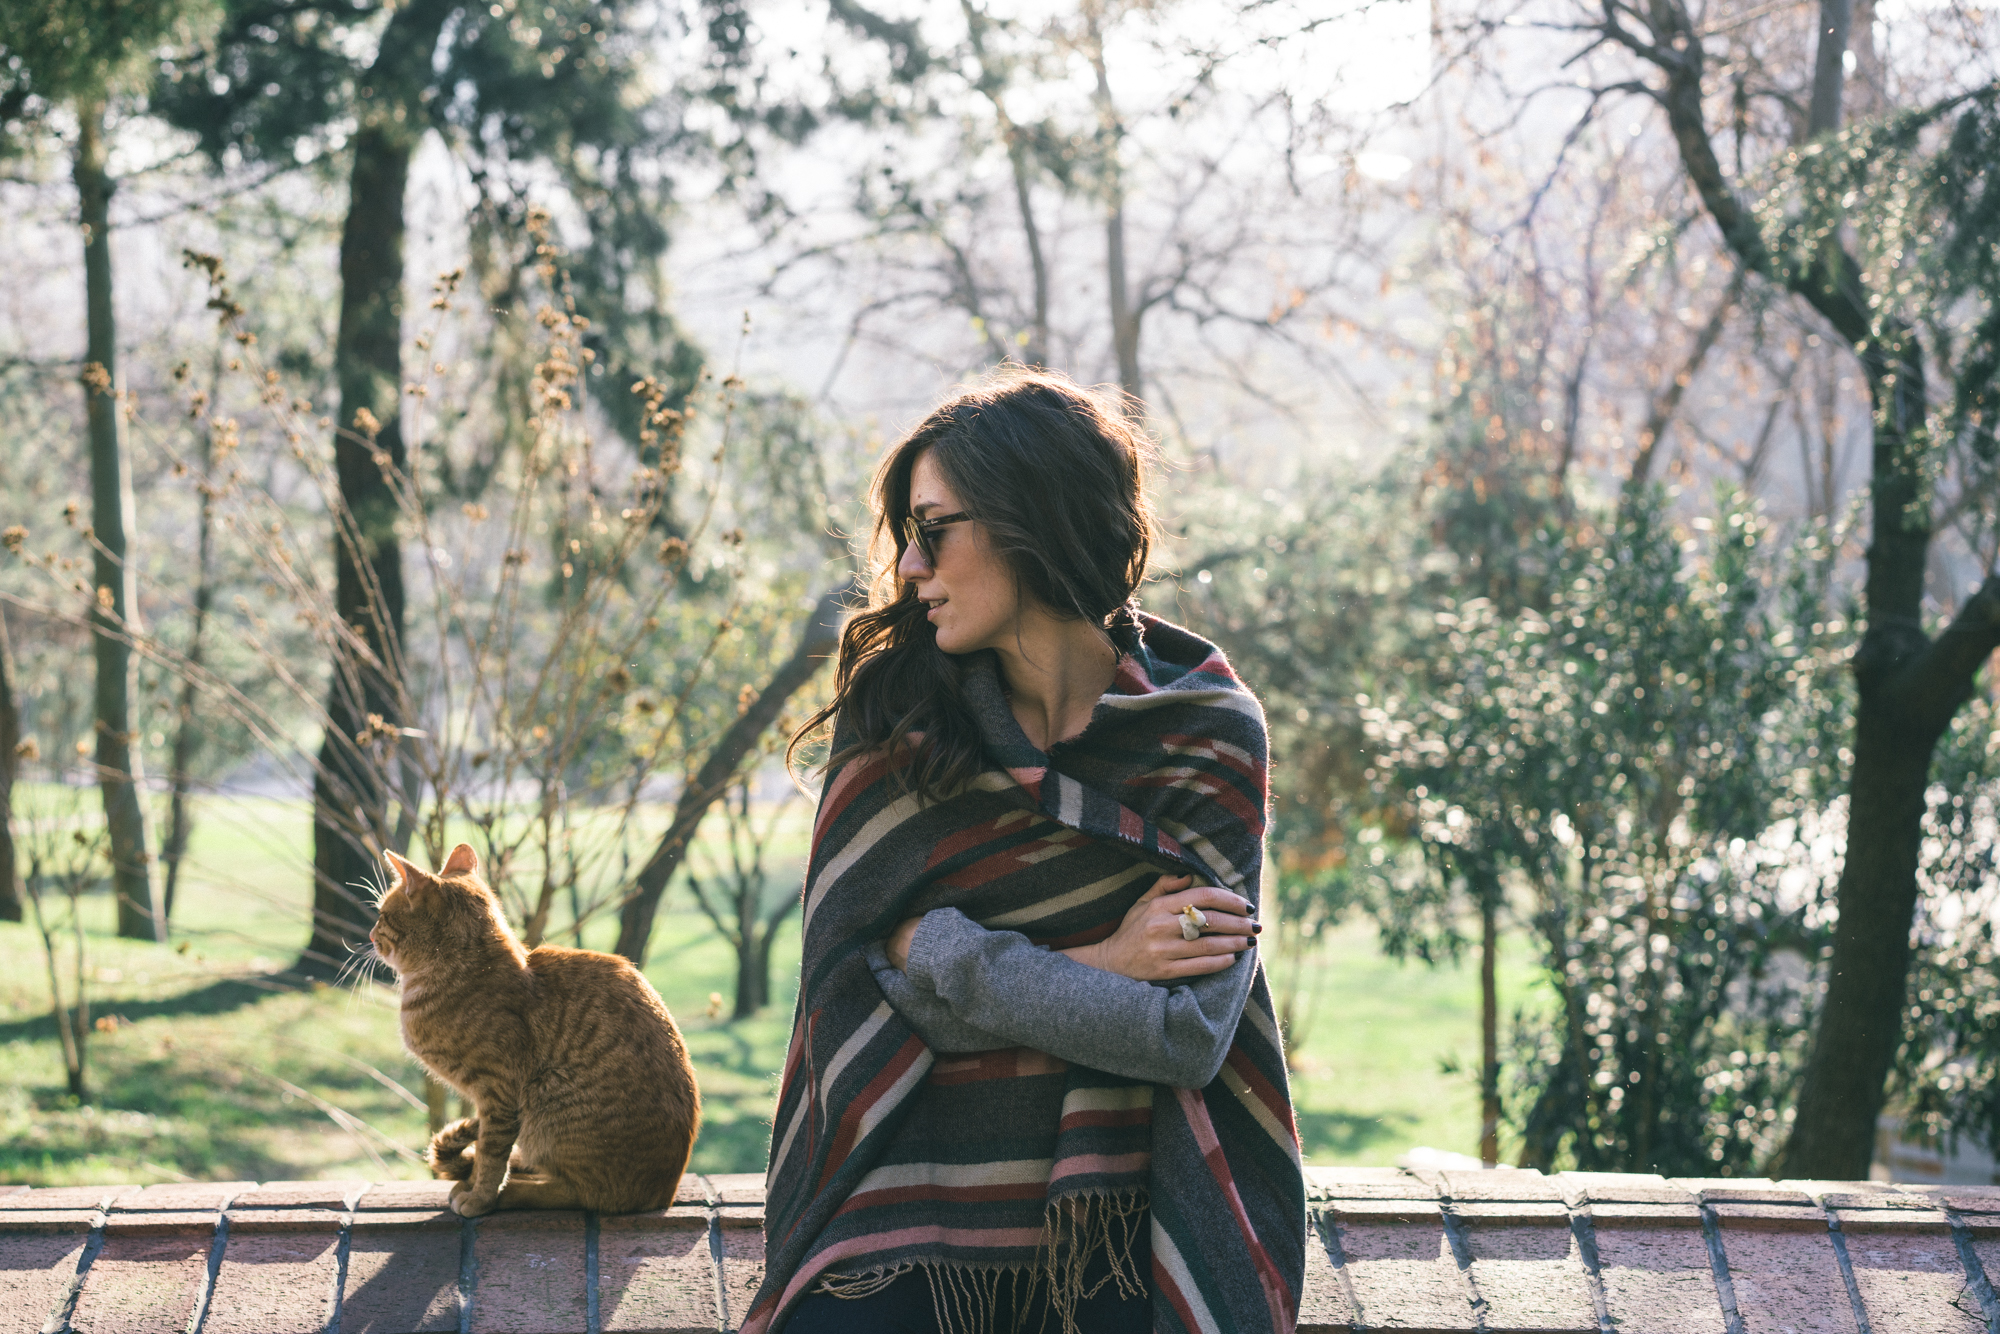 billur saatci, offnegiysem, turkish style blogger, street style, fashion, ootd, blogger, istanbul, mavi, mavi gold, boho, ilovemavi, bohemian style,